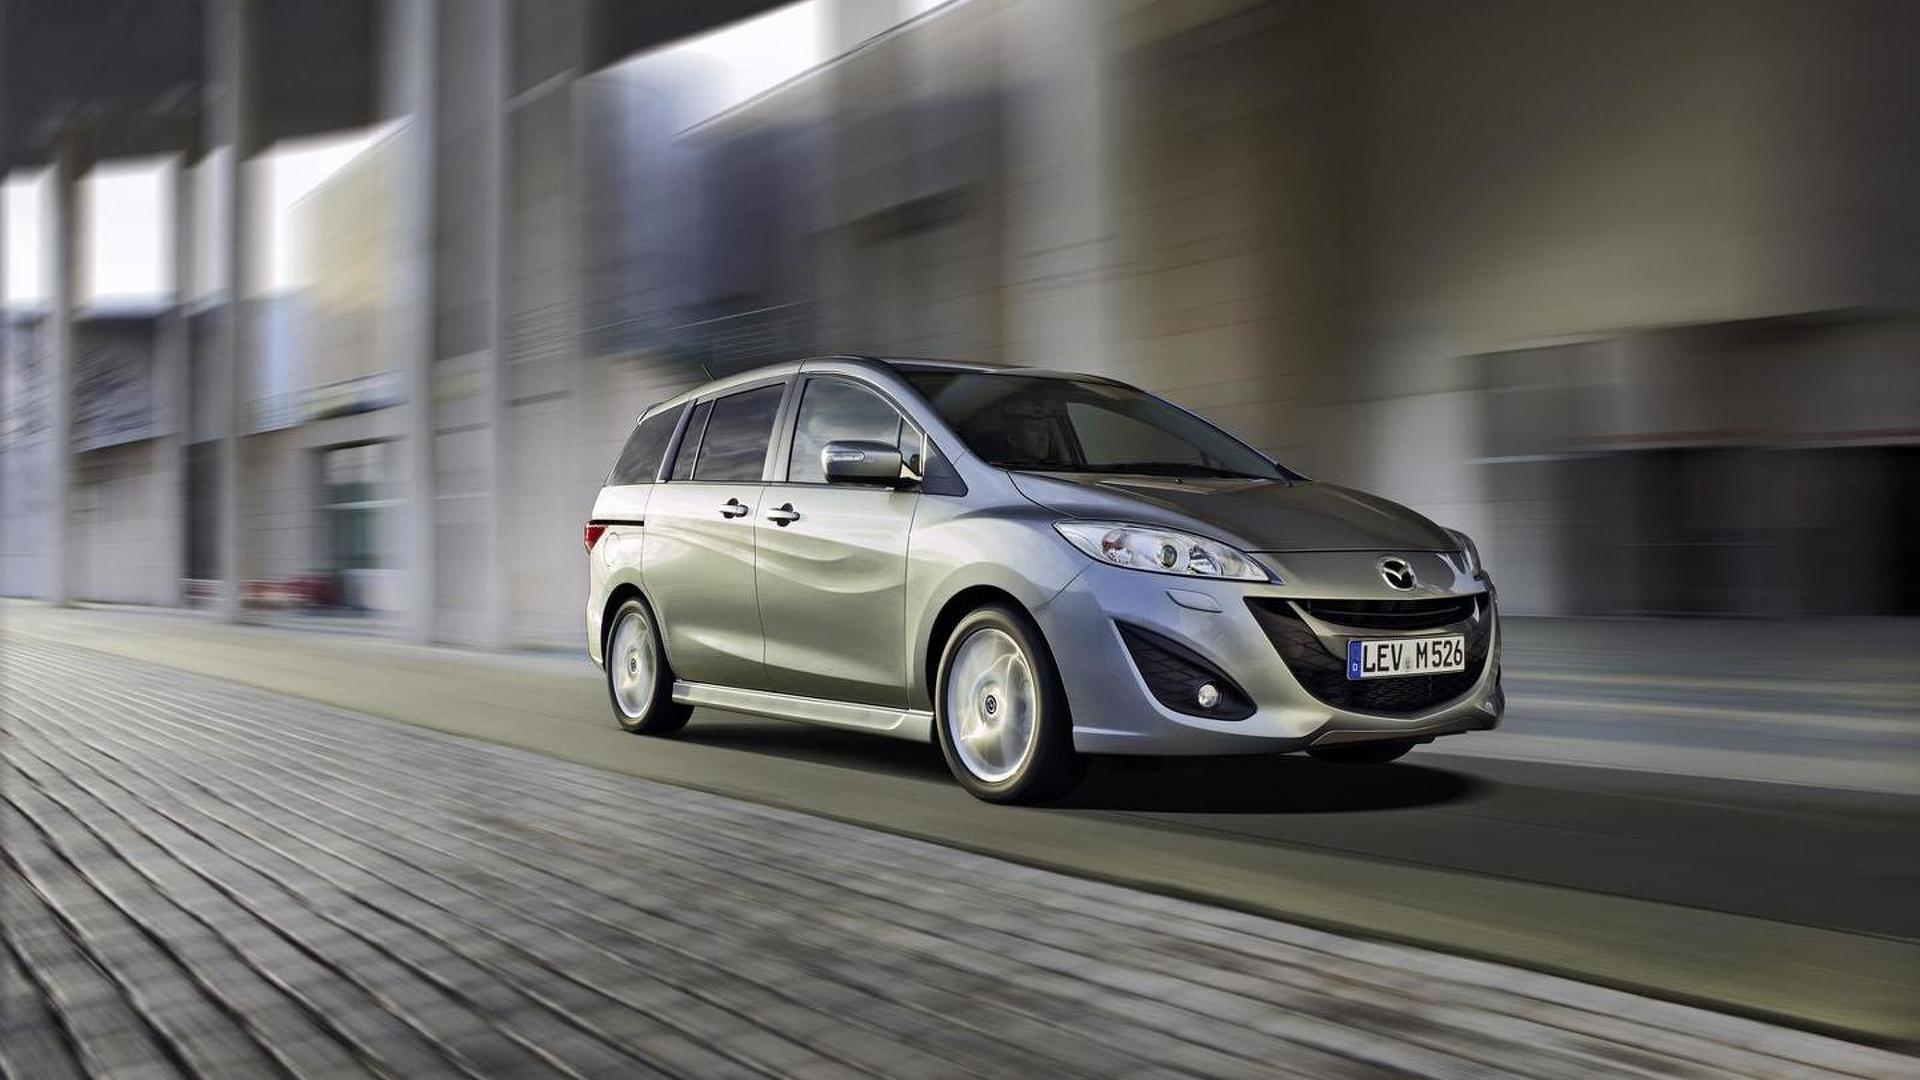 Mazda5 demise confirmed after 2015 model year